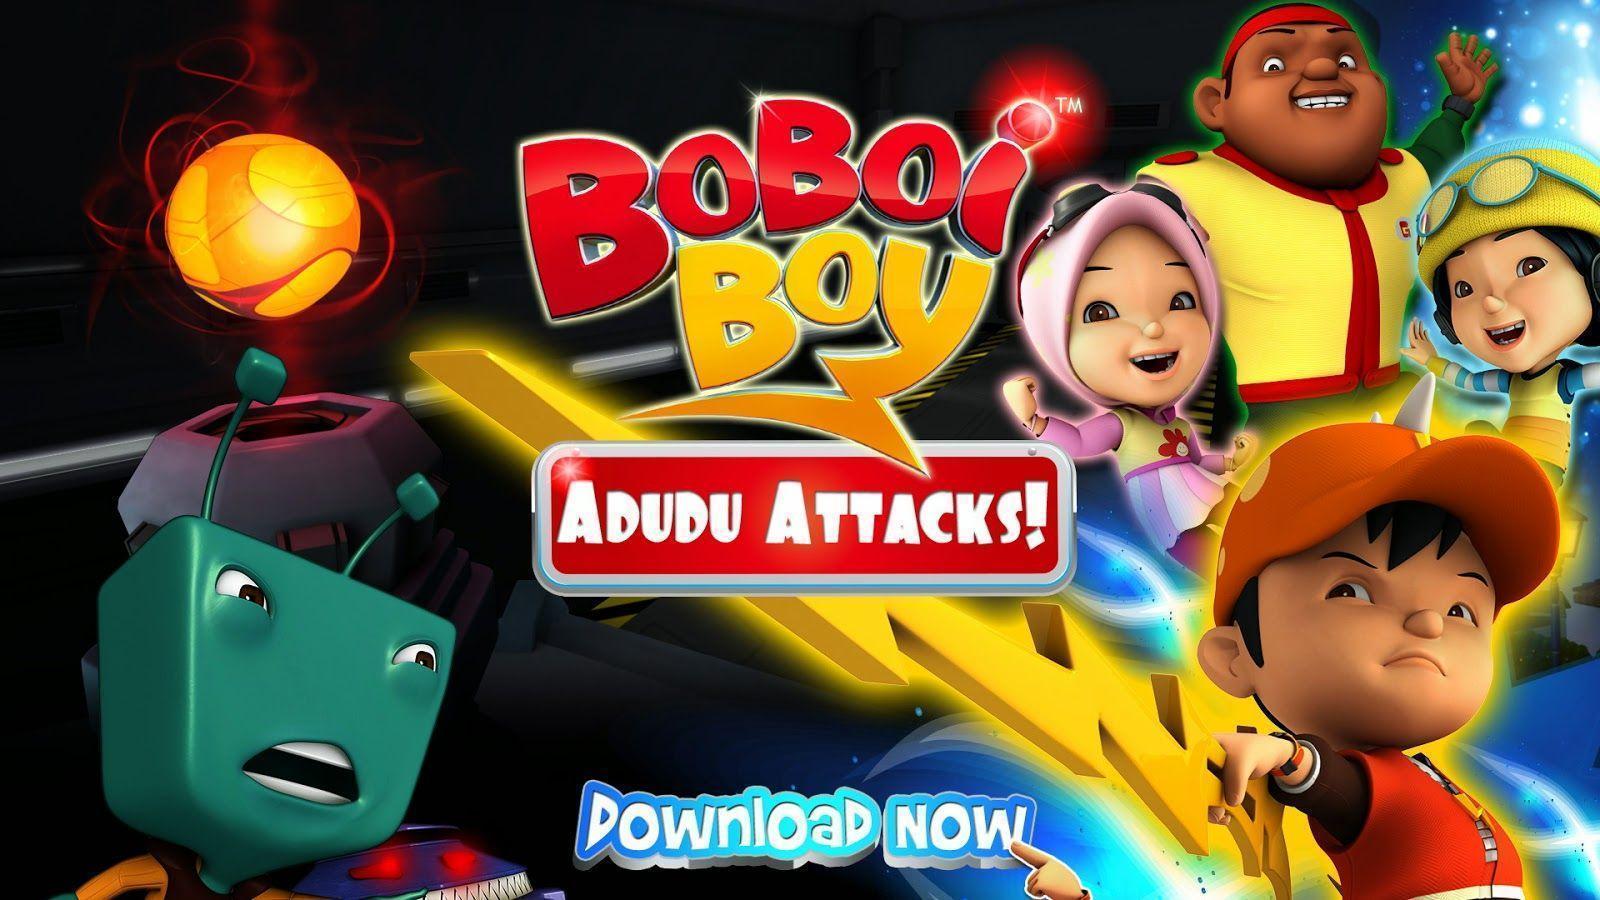 BoBoiBoy Wallpapers 1600x900